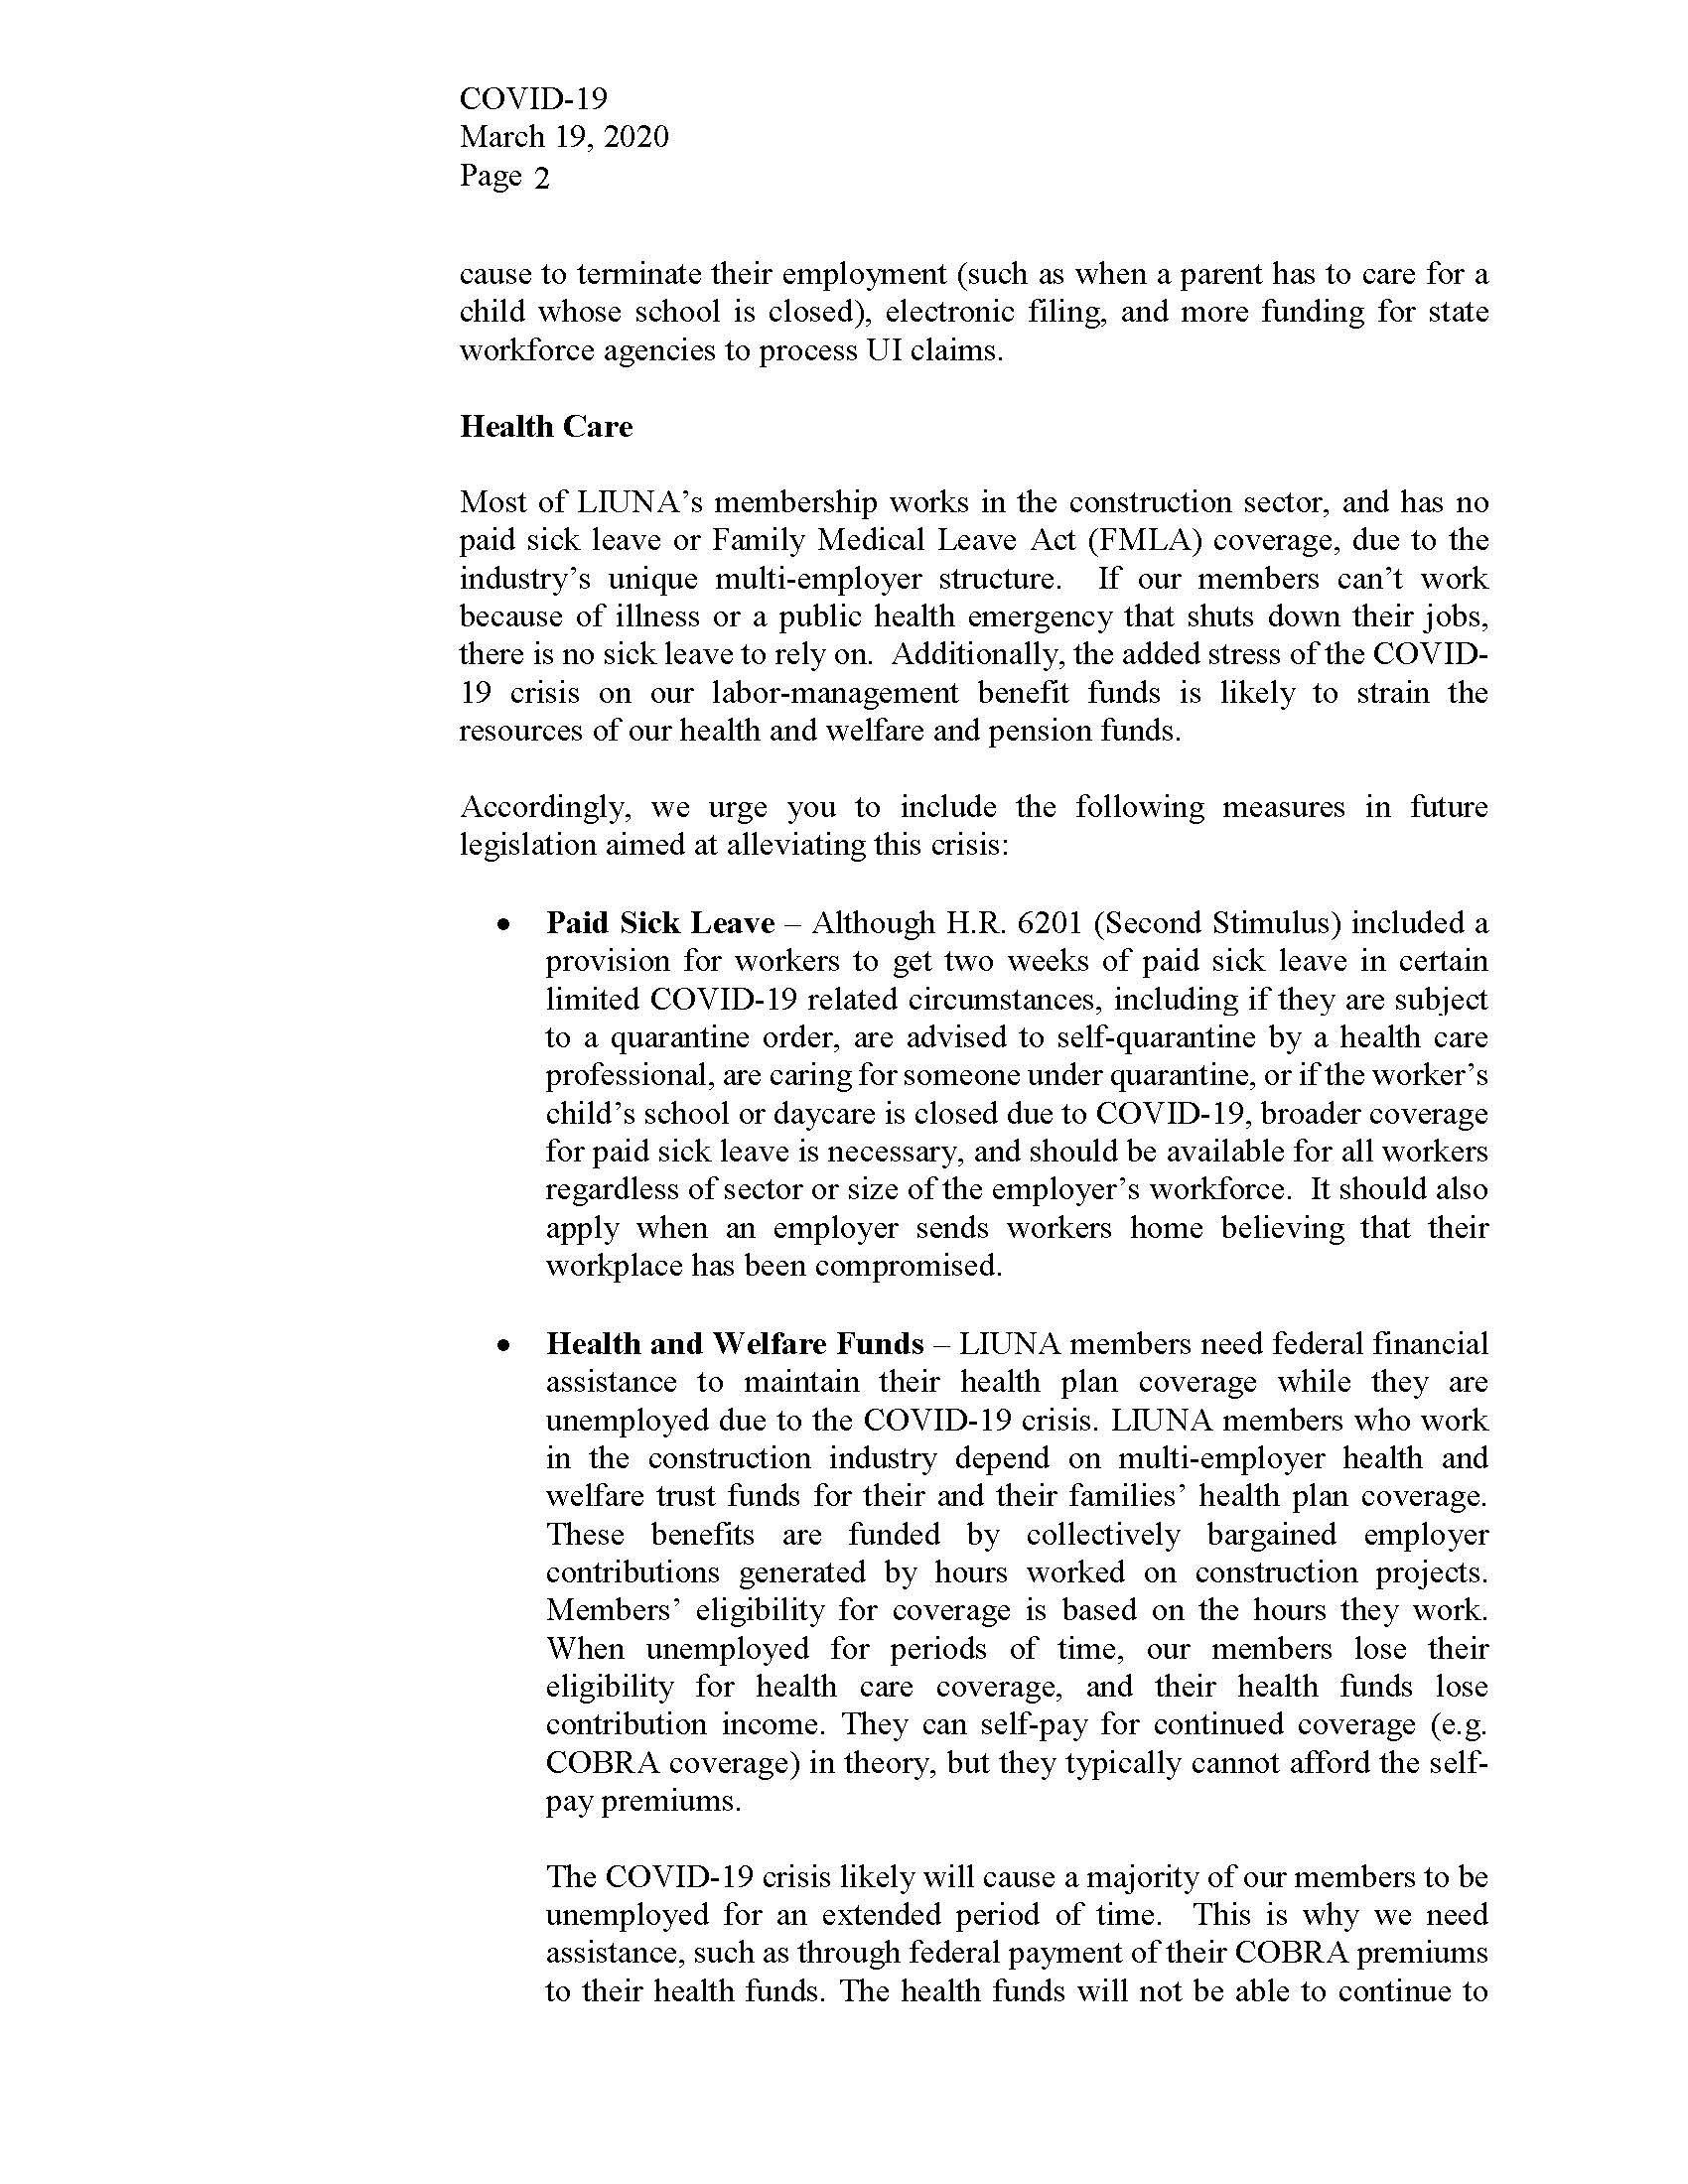 LIUNA COVID-19 March 19 2020 Final Final_Page_2.jpg